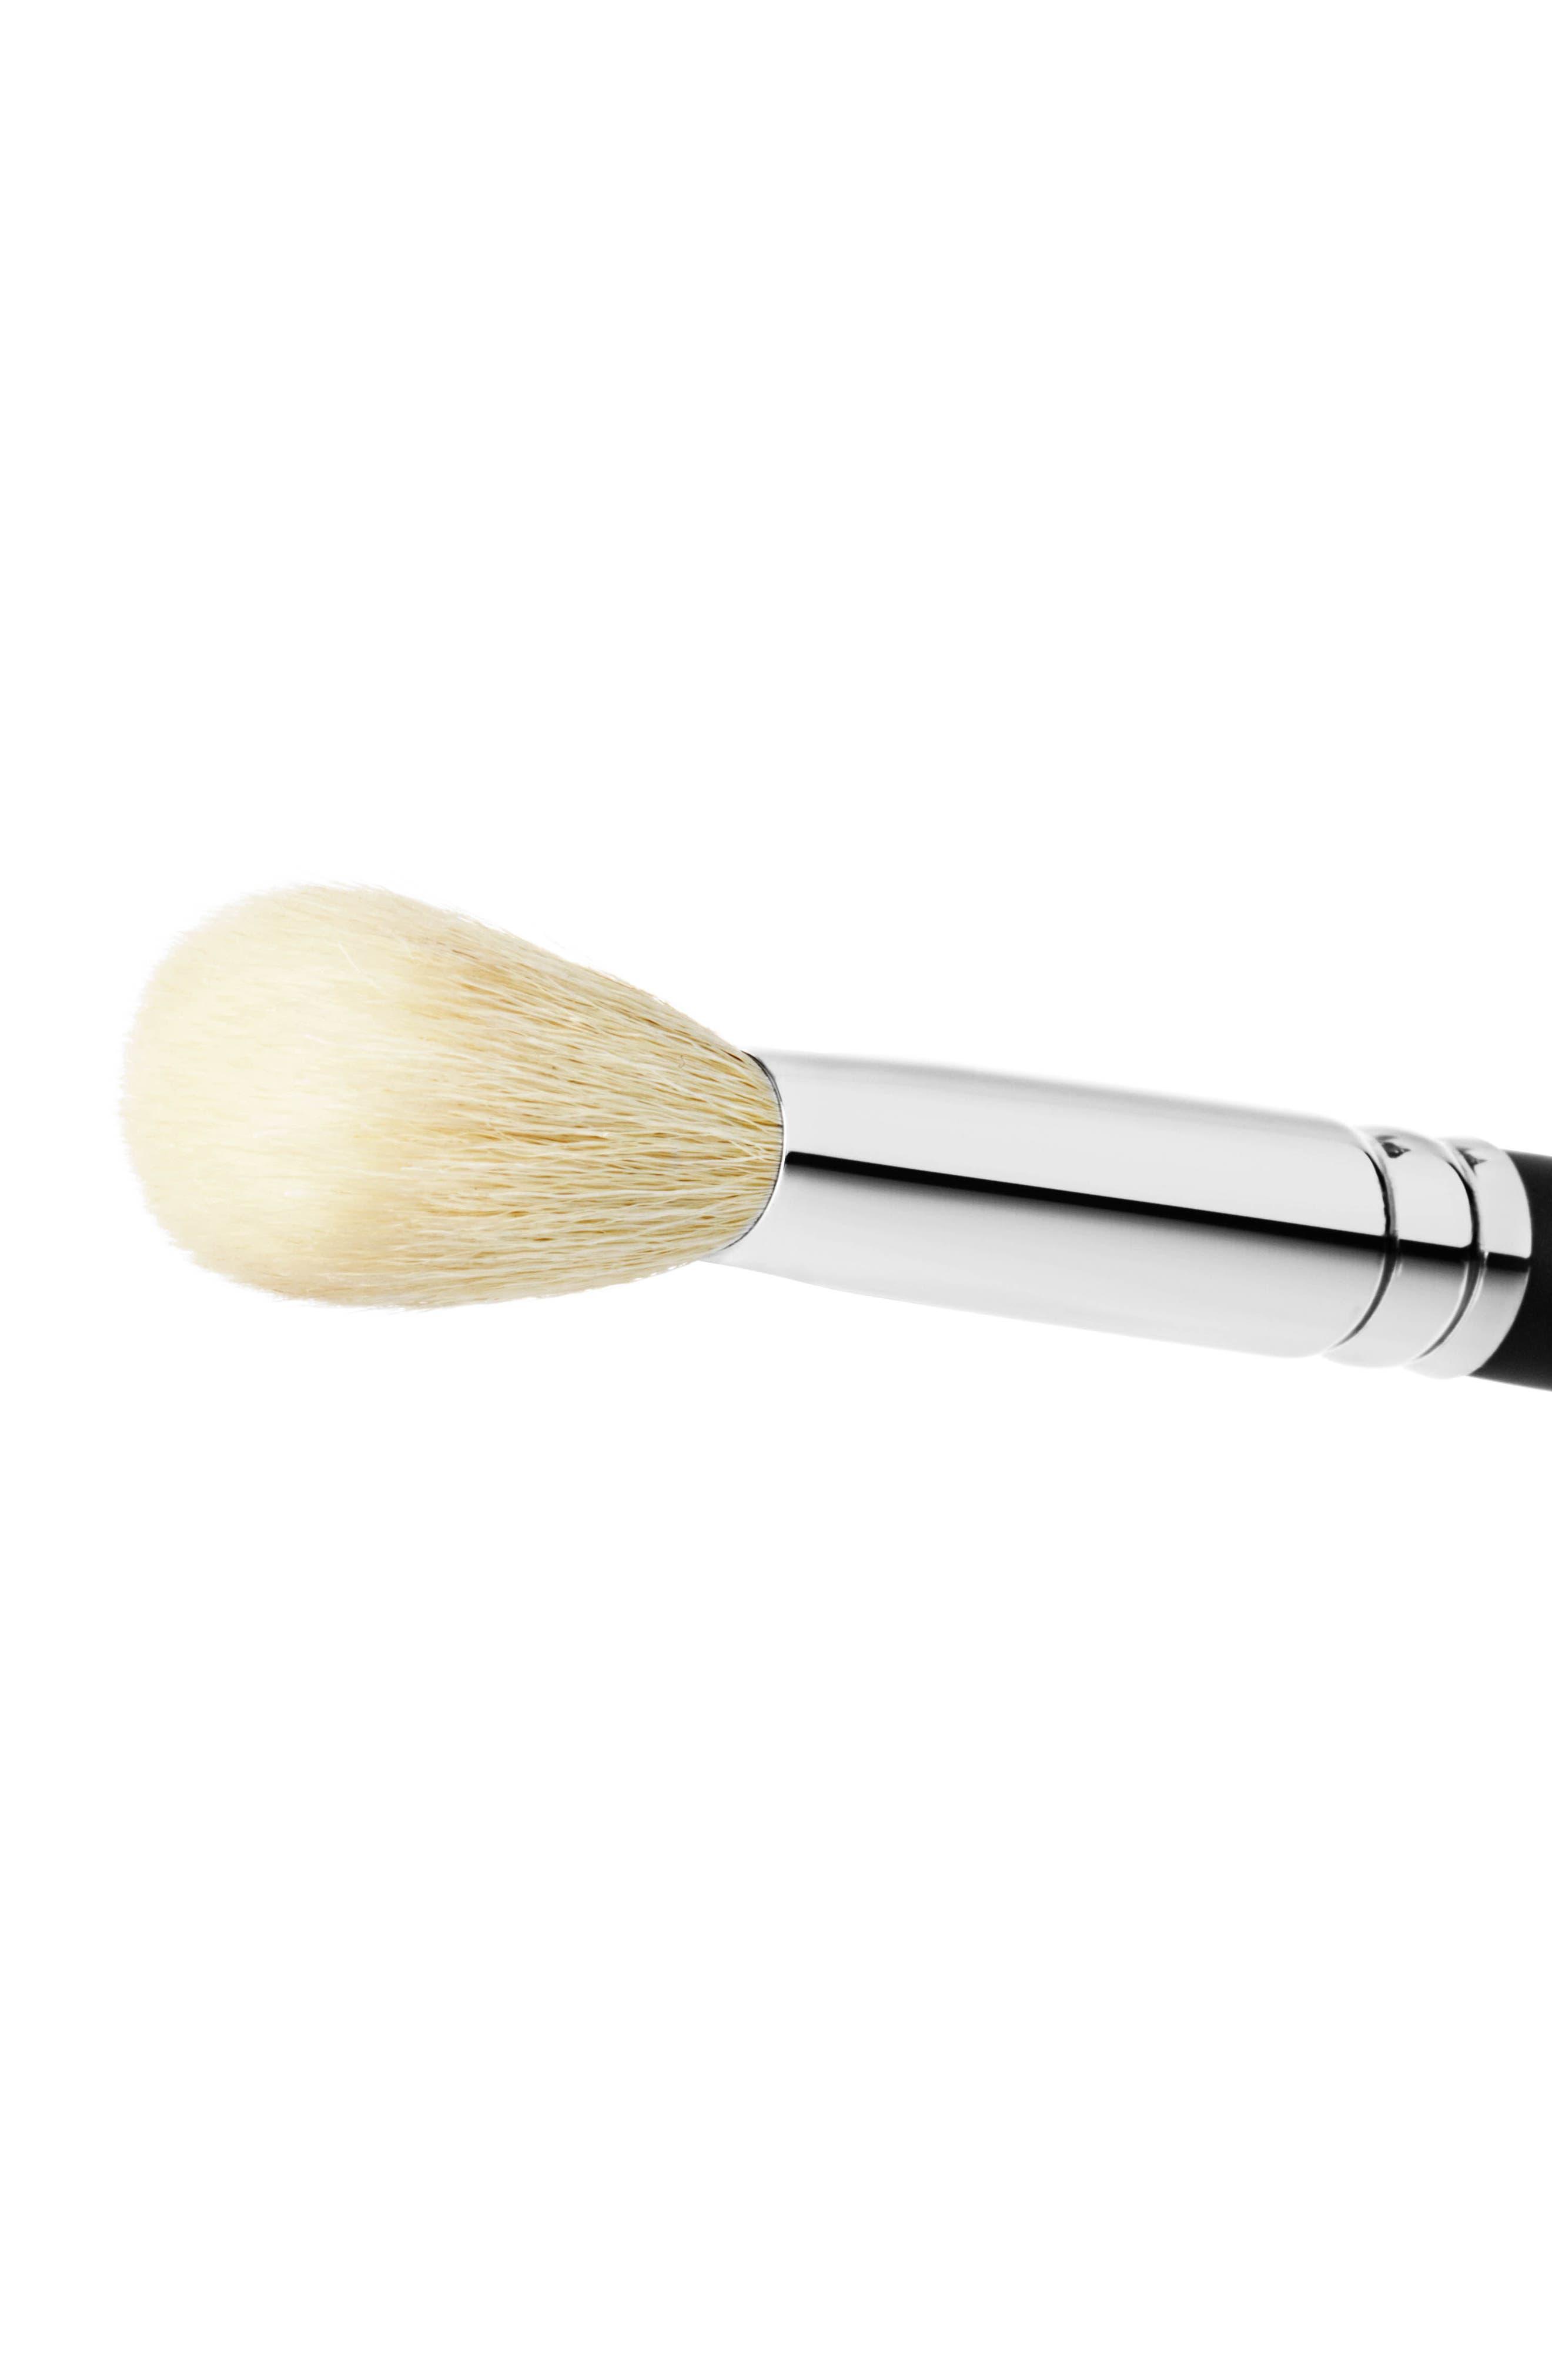 MAC 137S Synthetic Long Blending Brush,                             Alternate thumbnail 2, color,                             No Color